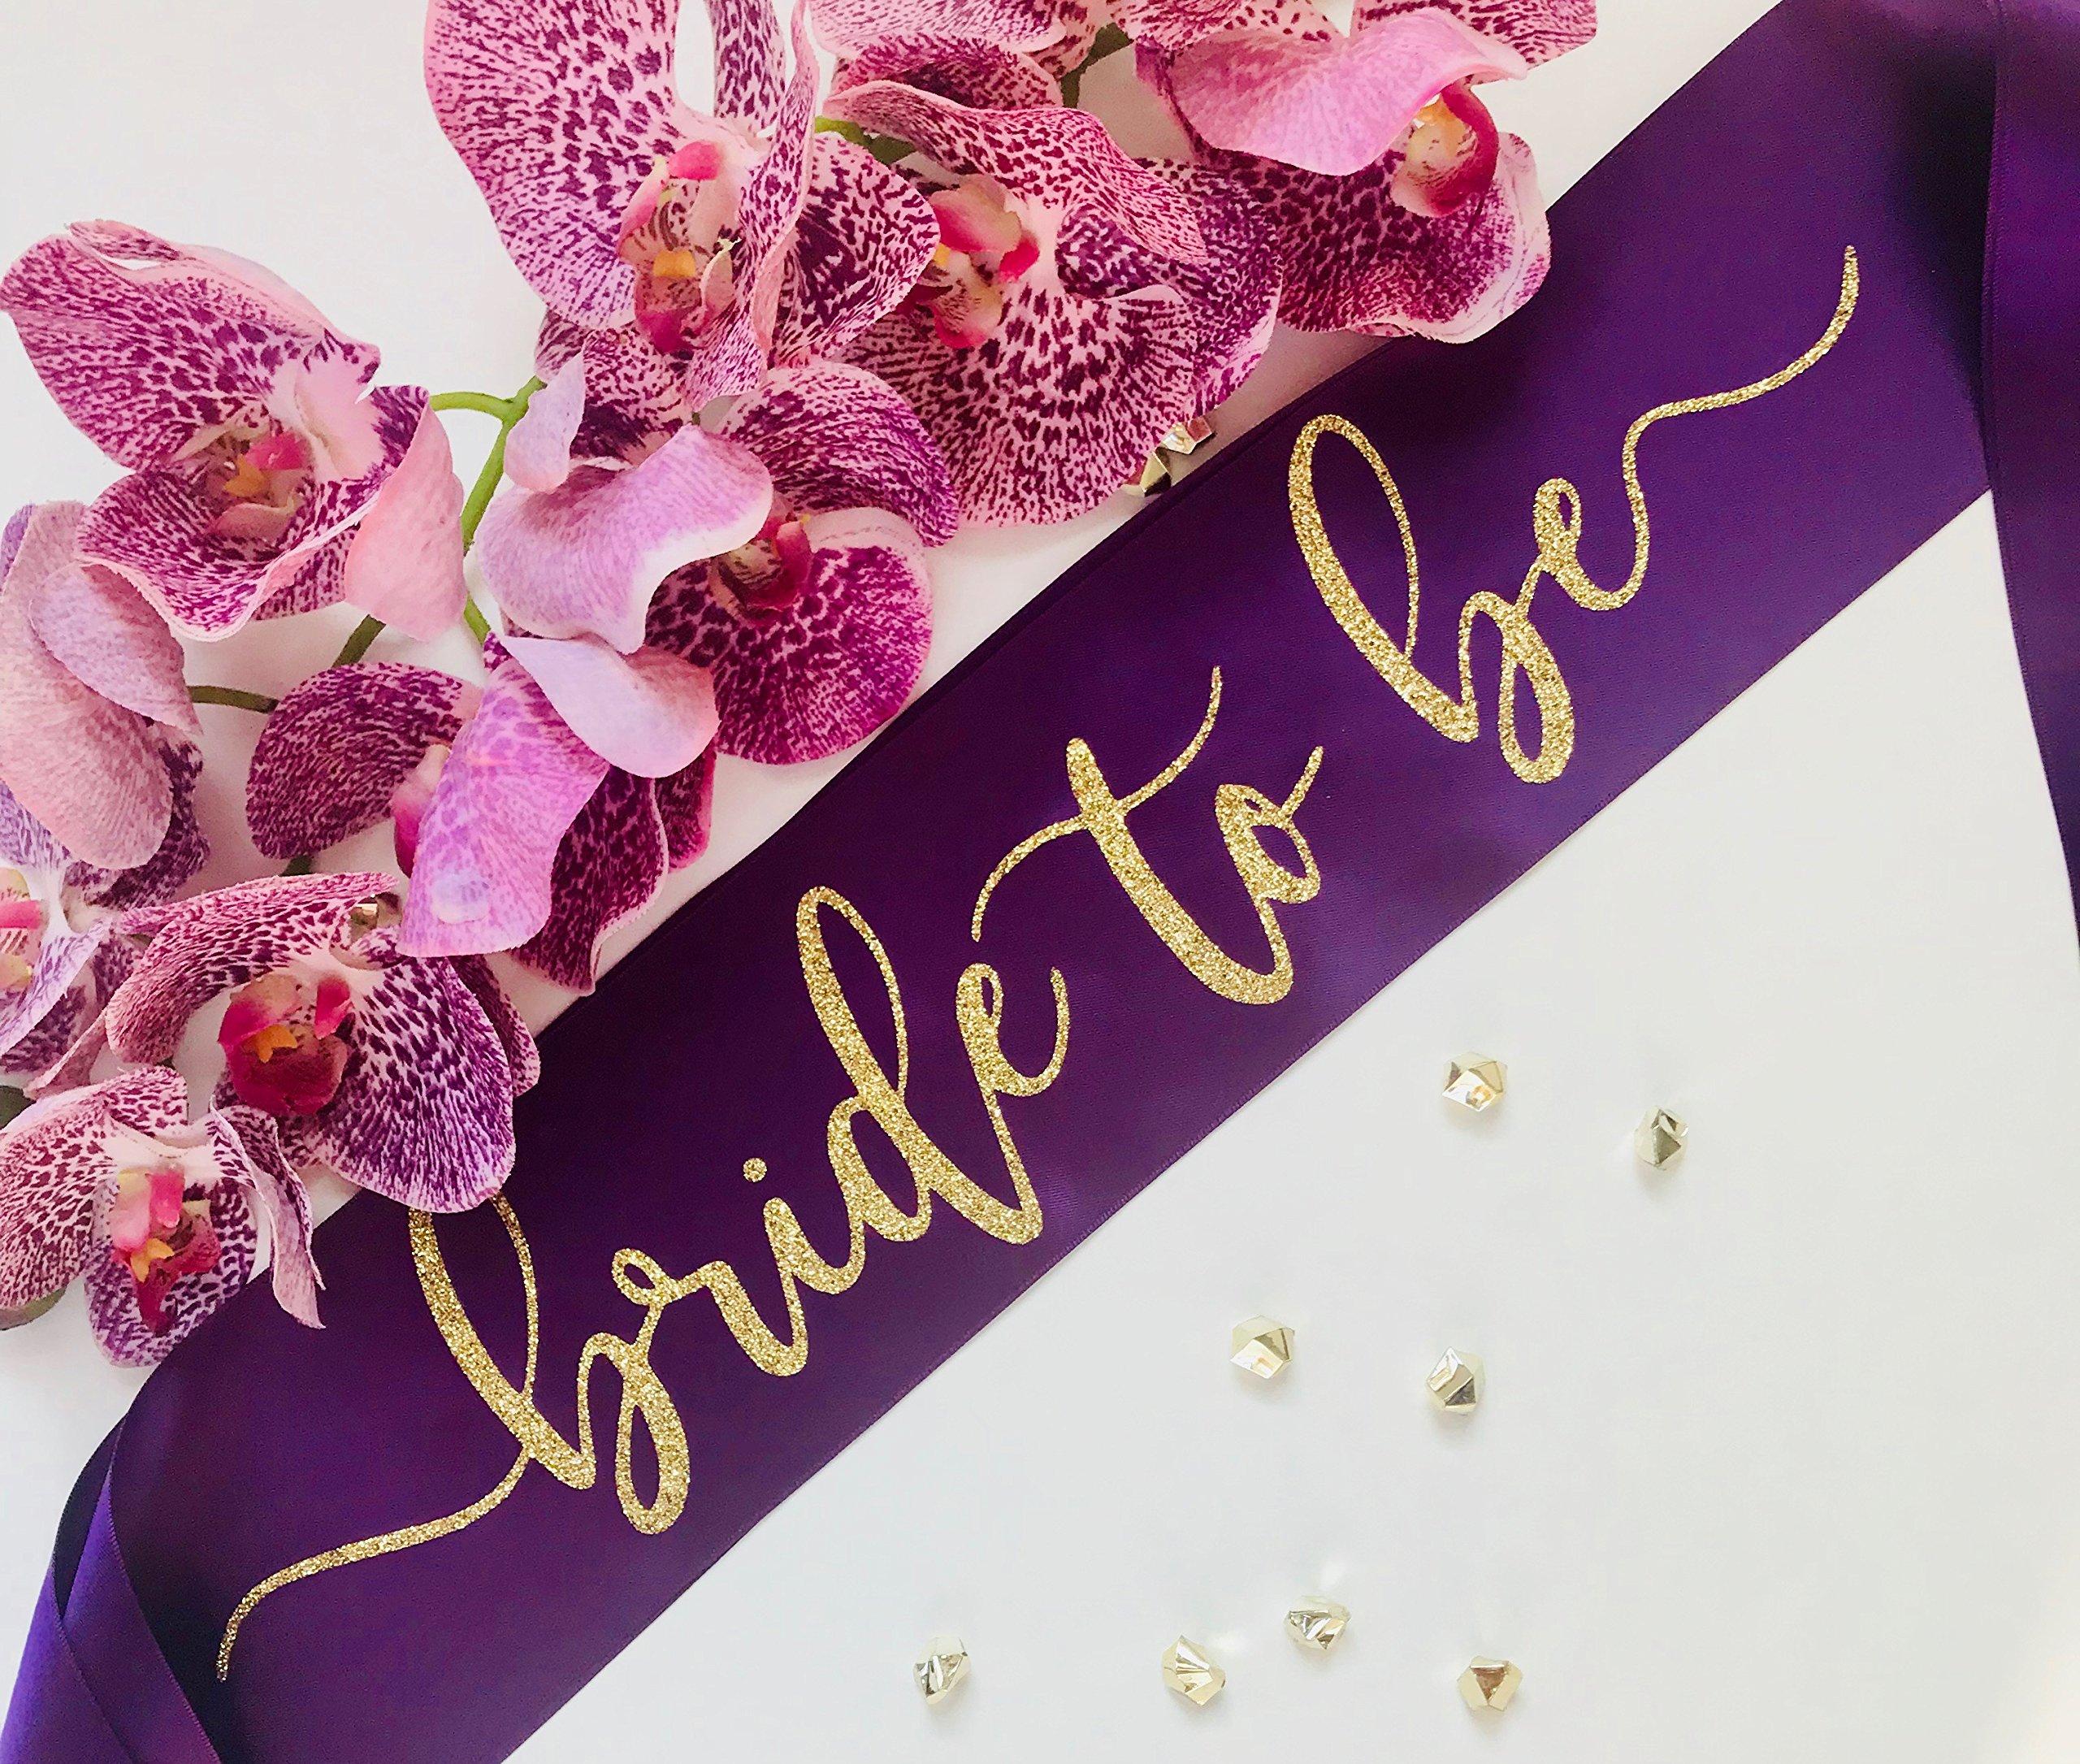 Bride To Be Sash Plum With Gold Glitter Font - Bachelorette Party Sash - Engagement Party Sash by J & B Enterprises